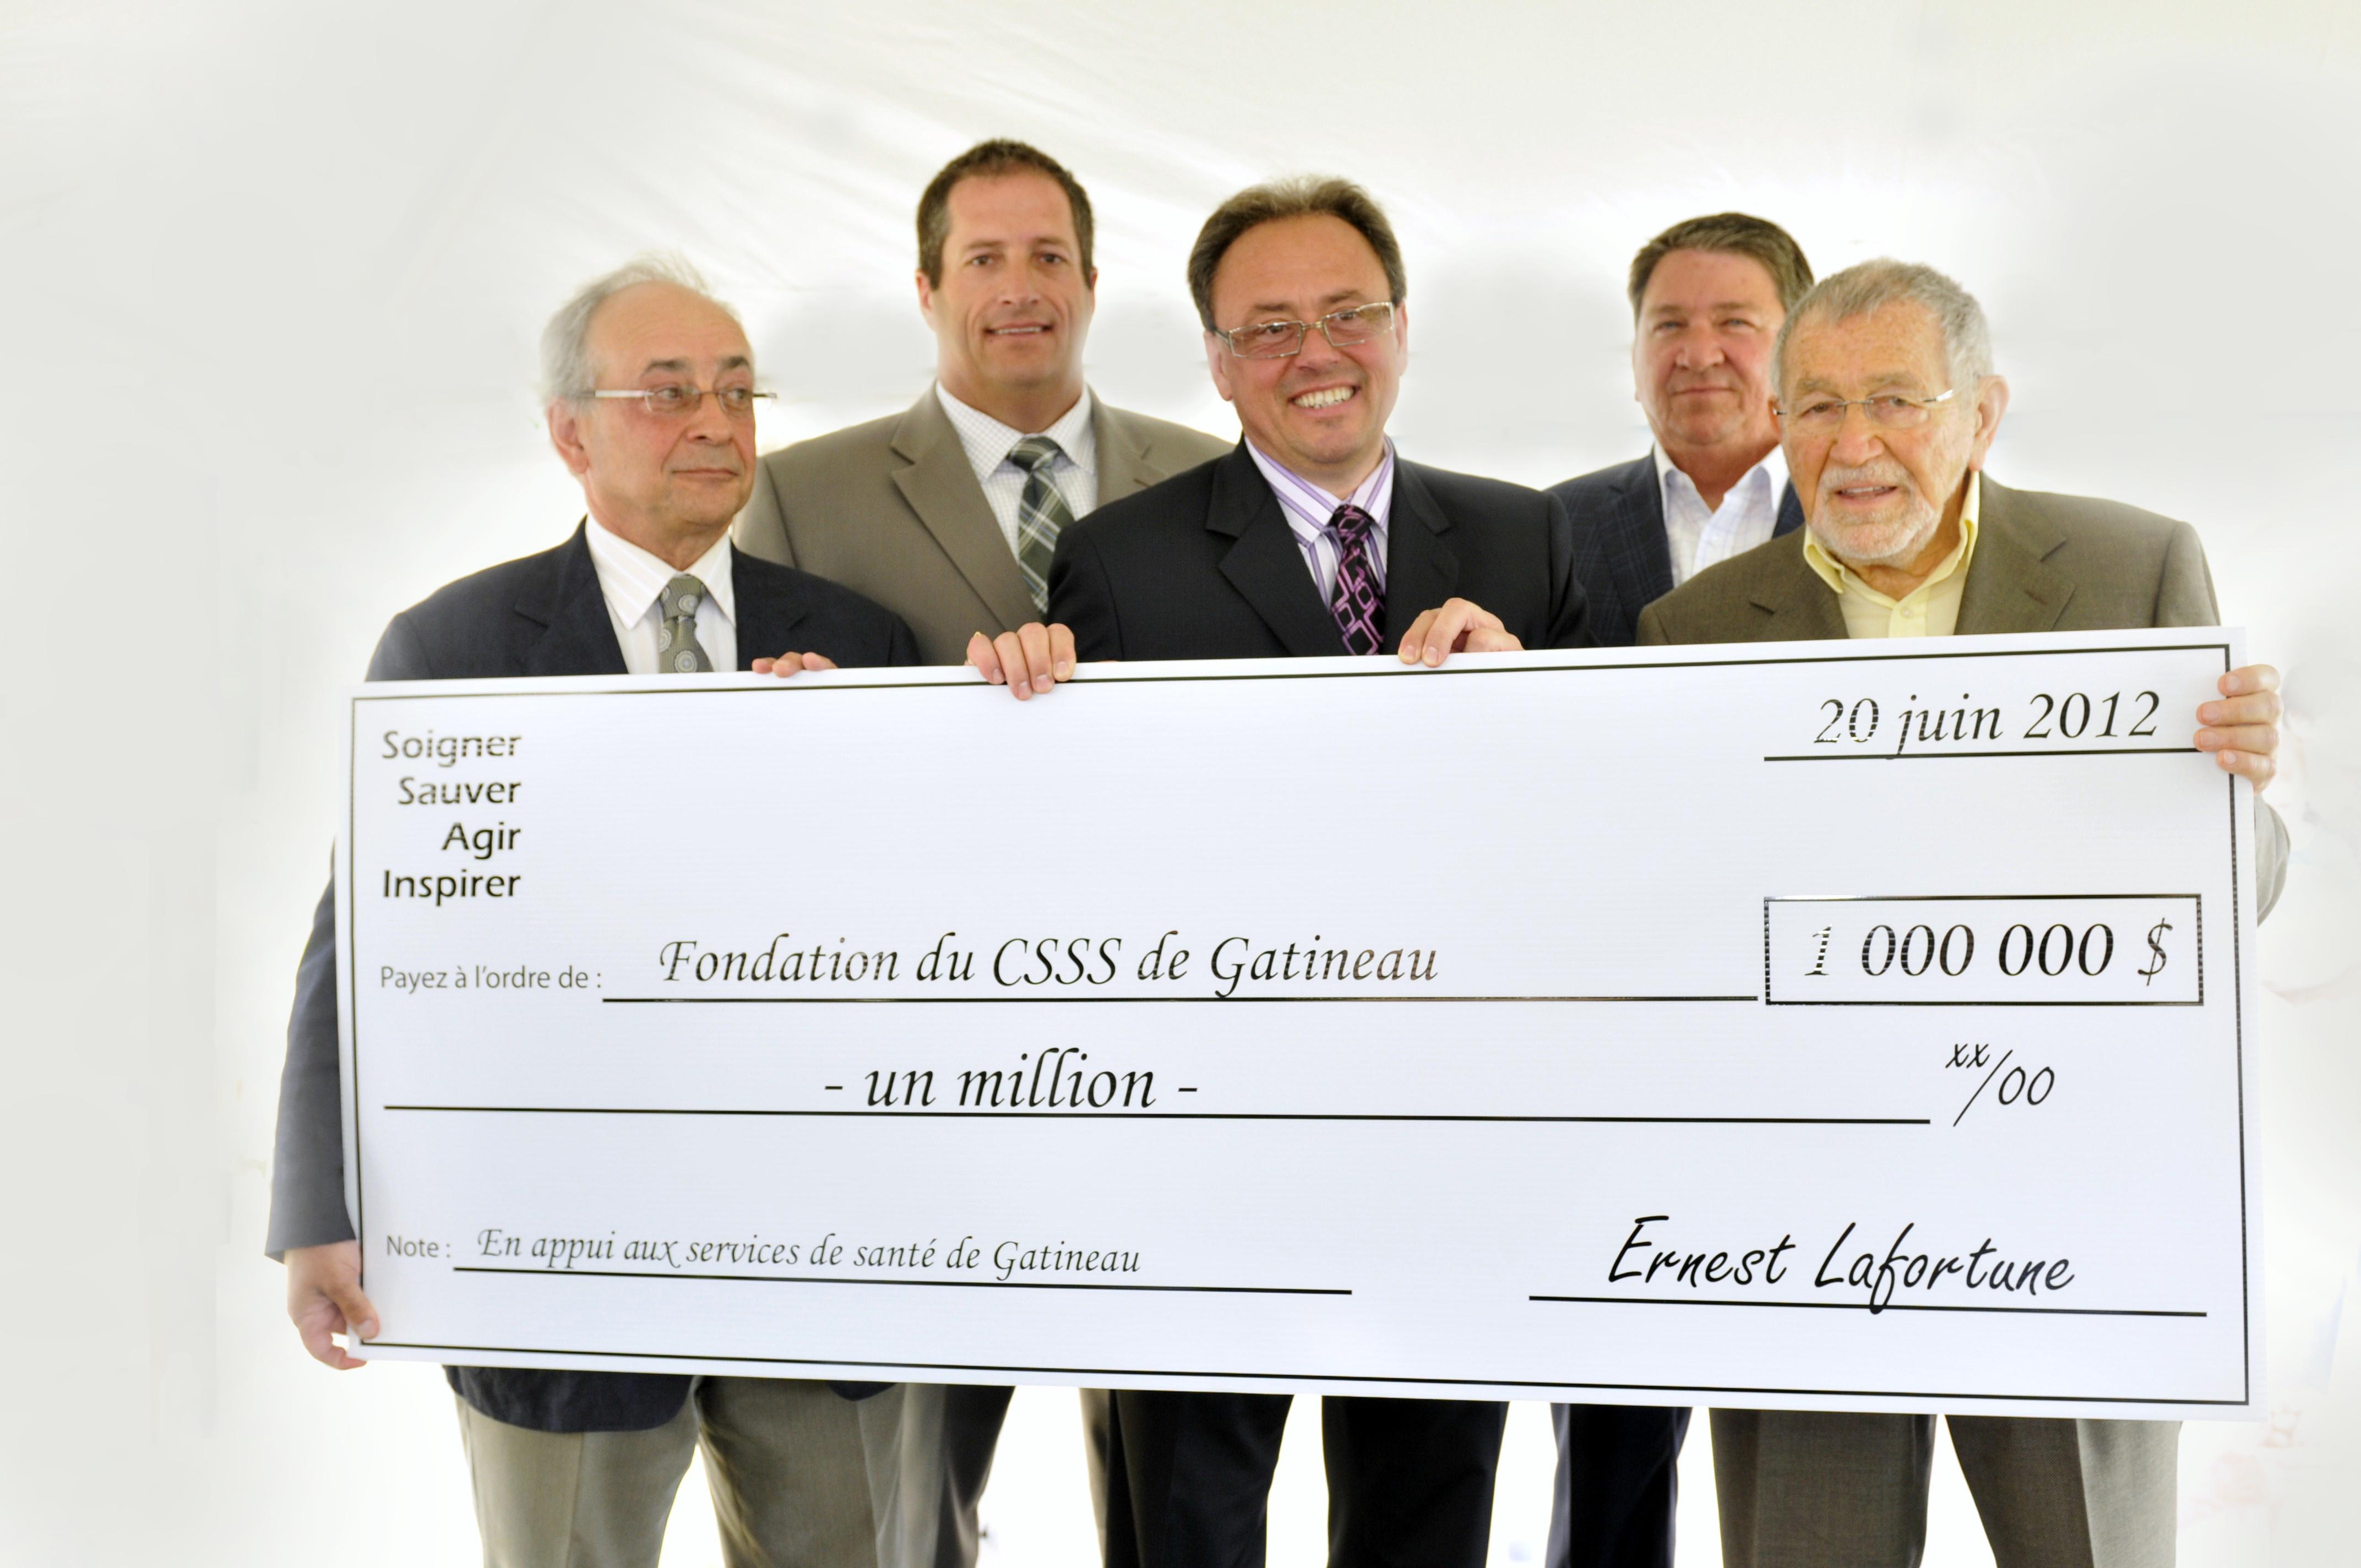 La Fondation reçoit 1 000 000 $!